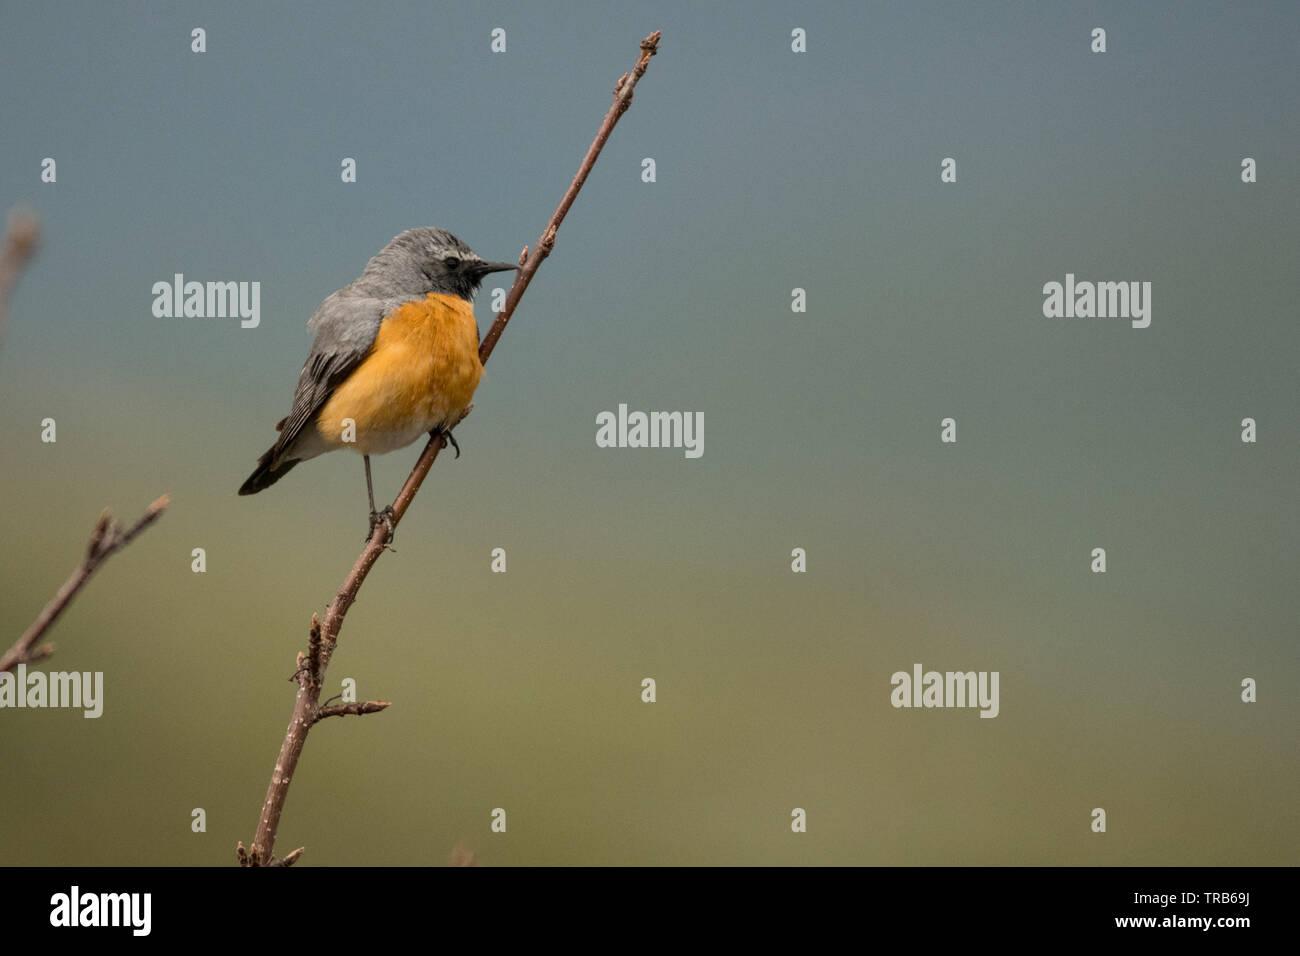 Stunning bird photo. White-throated robin (Irania gutturalis). Stock Photo